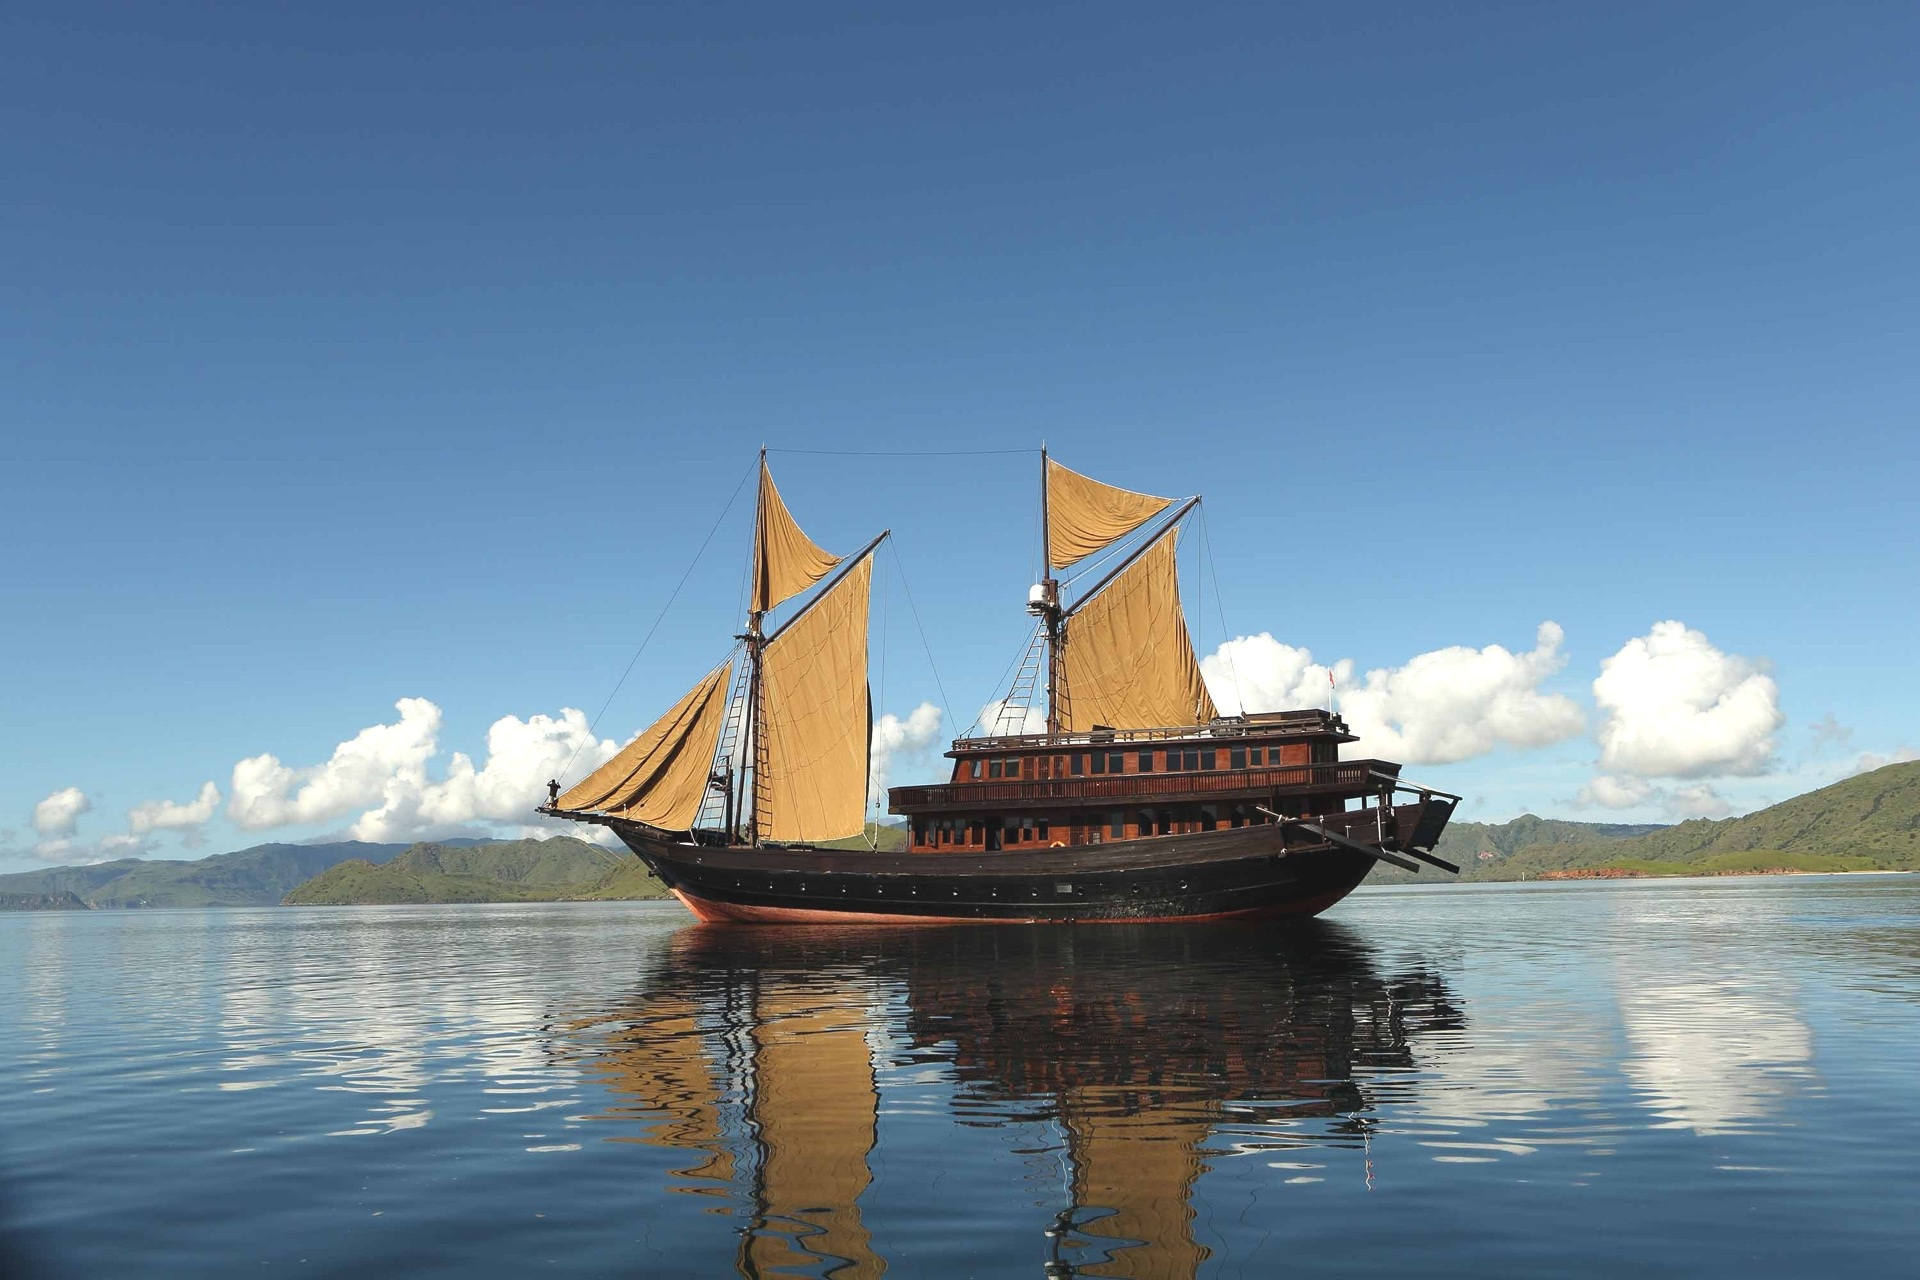 Copy of Alila Purnama - South Pacific & Indonesia